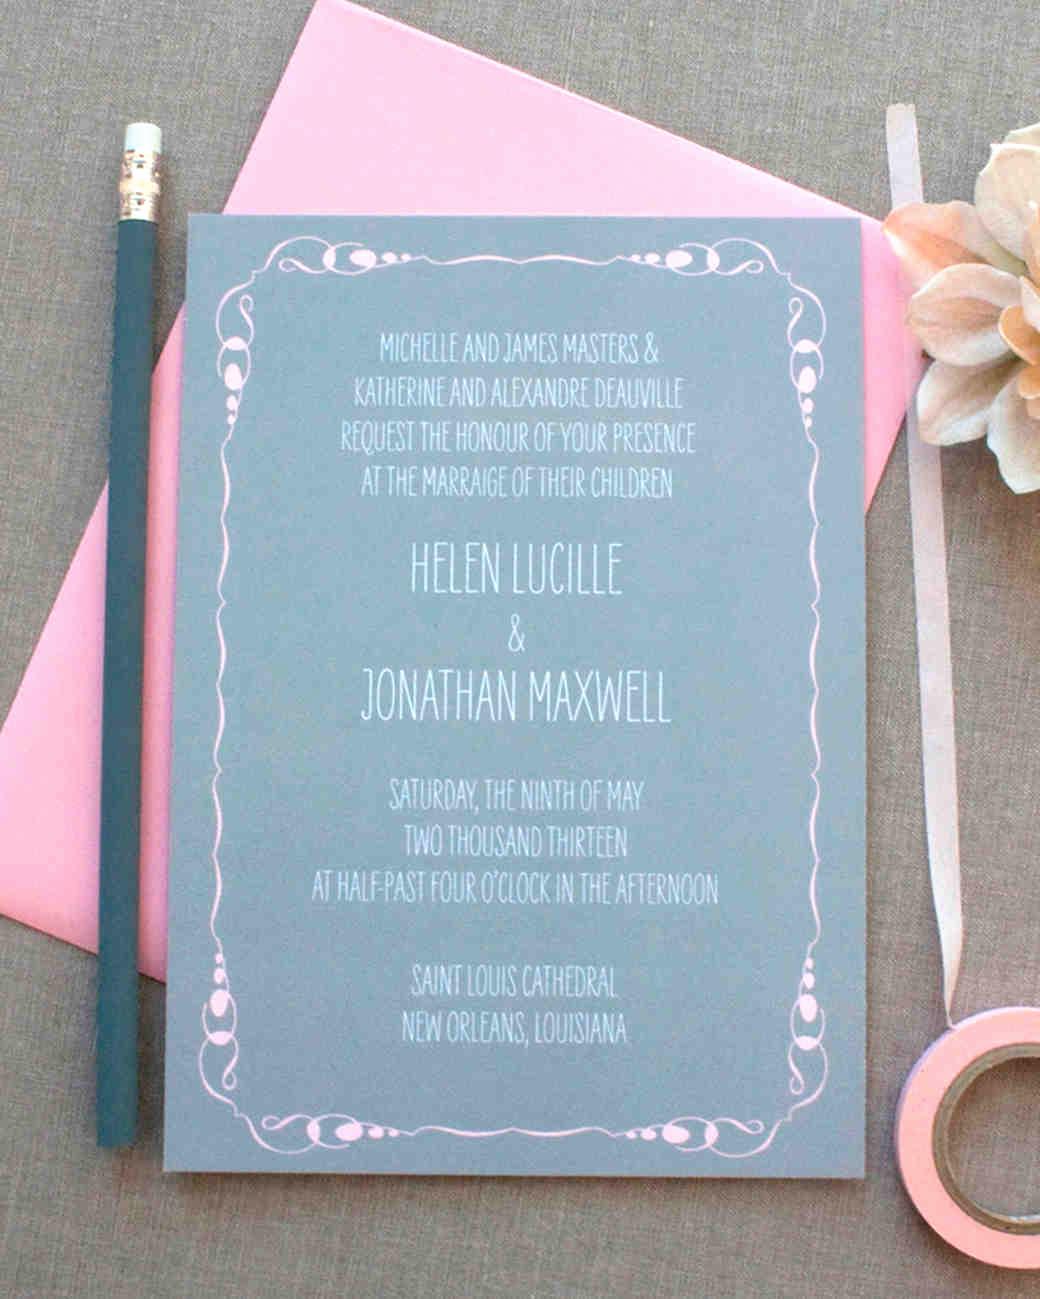 Informal Wedding Invitation Wording Beautiful 8 Details to Include when Wording Your Wedding Invitation